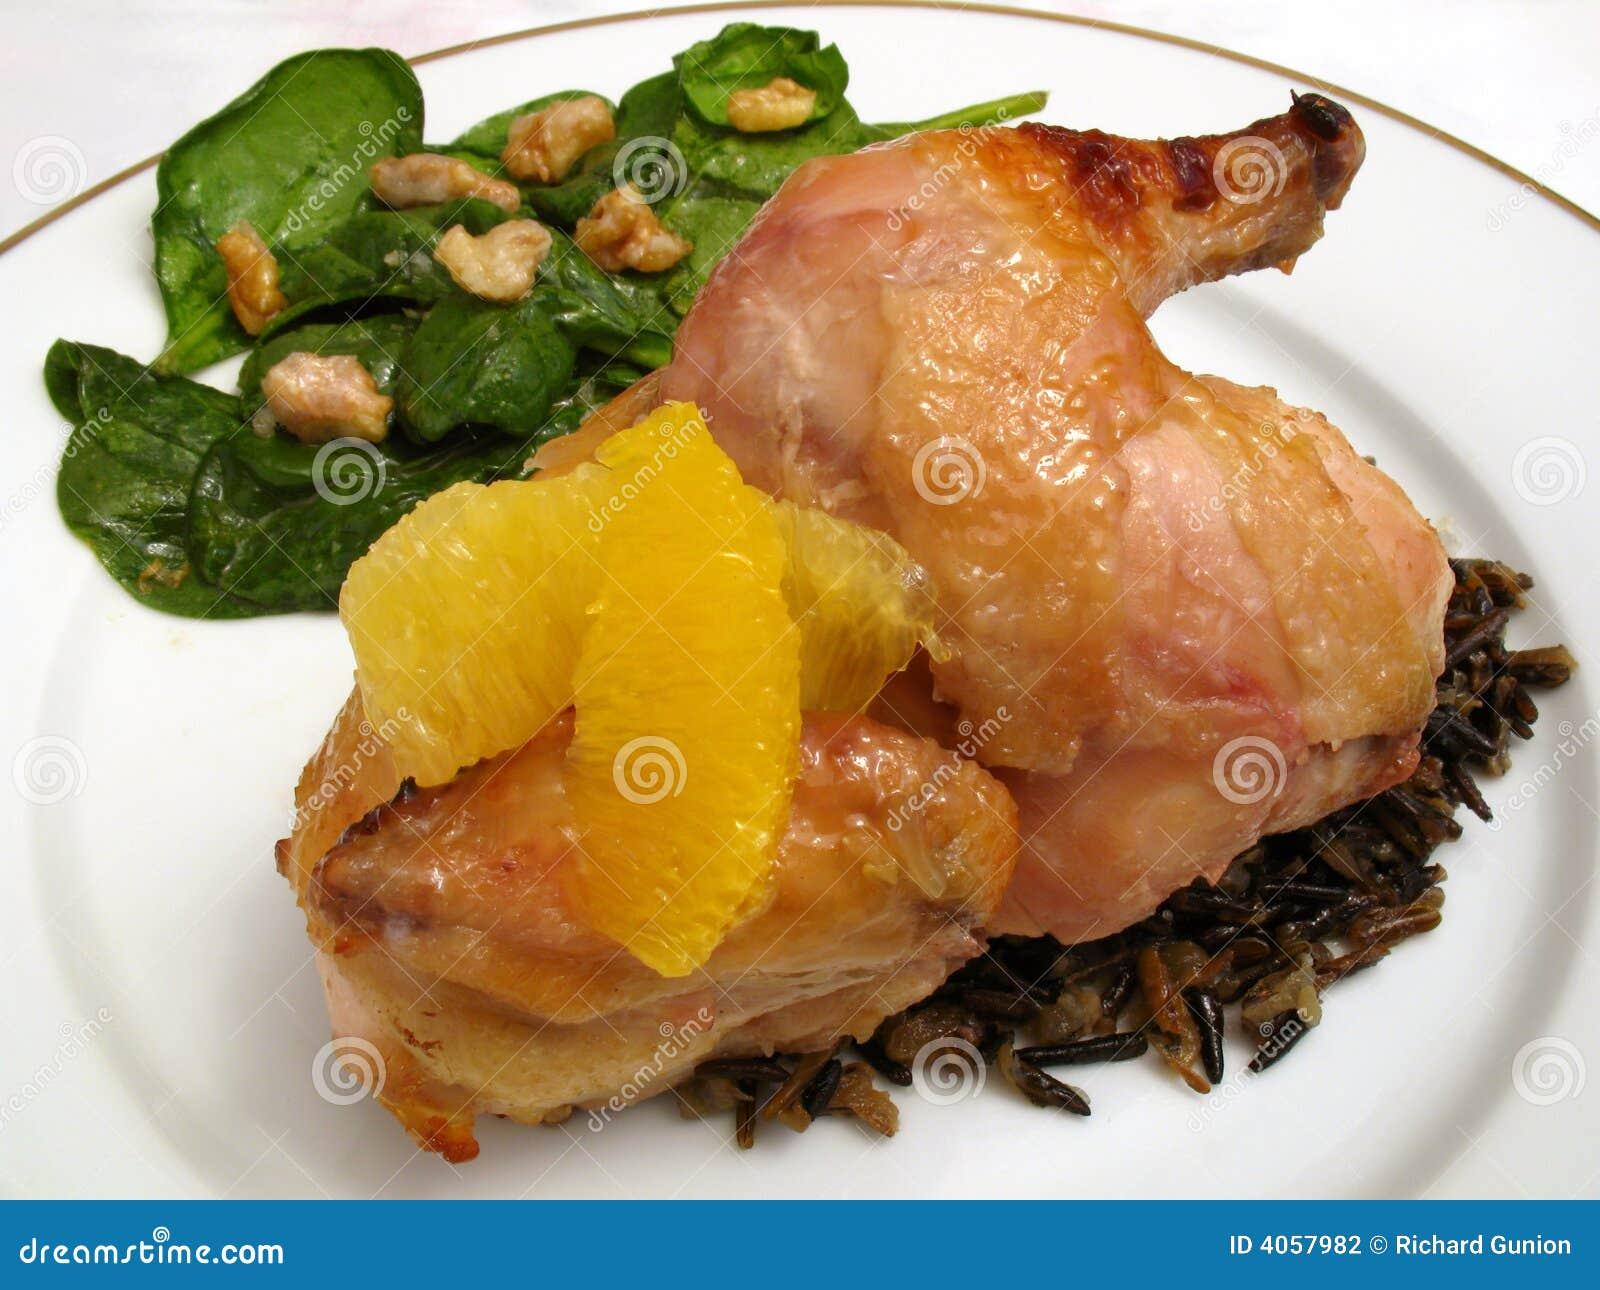 Glazed Cornish Game Hen